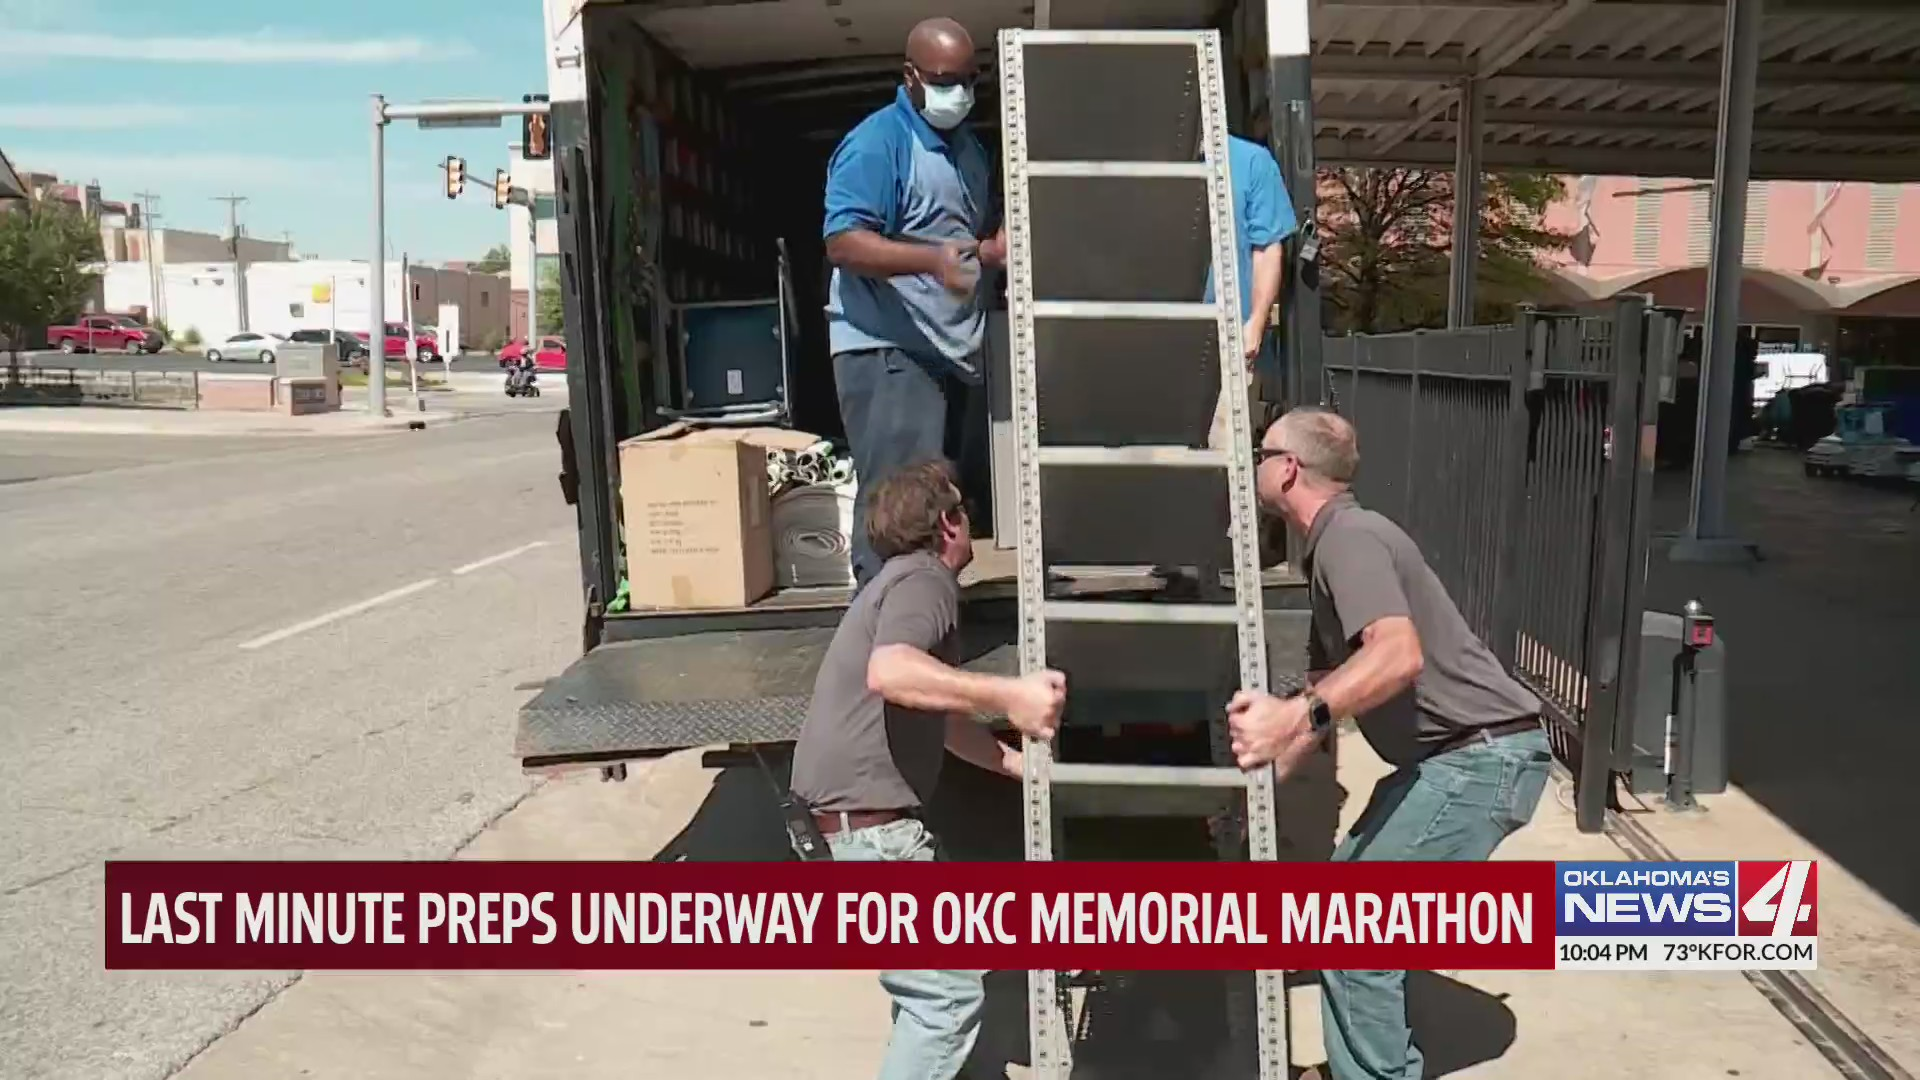 Men lift column into truck during Oklahoma City Memorial Marathon preparations